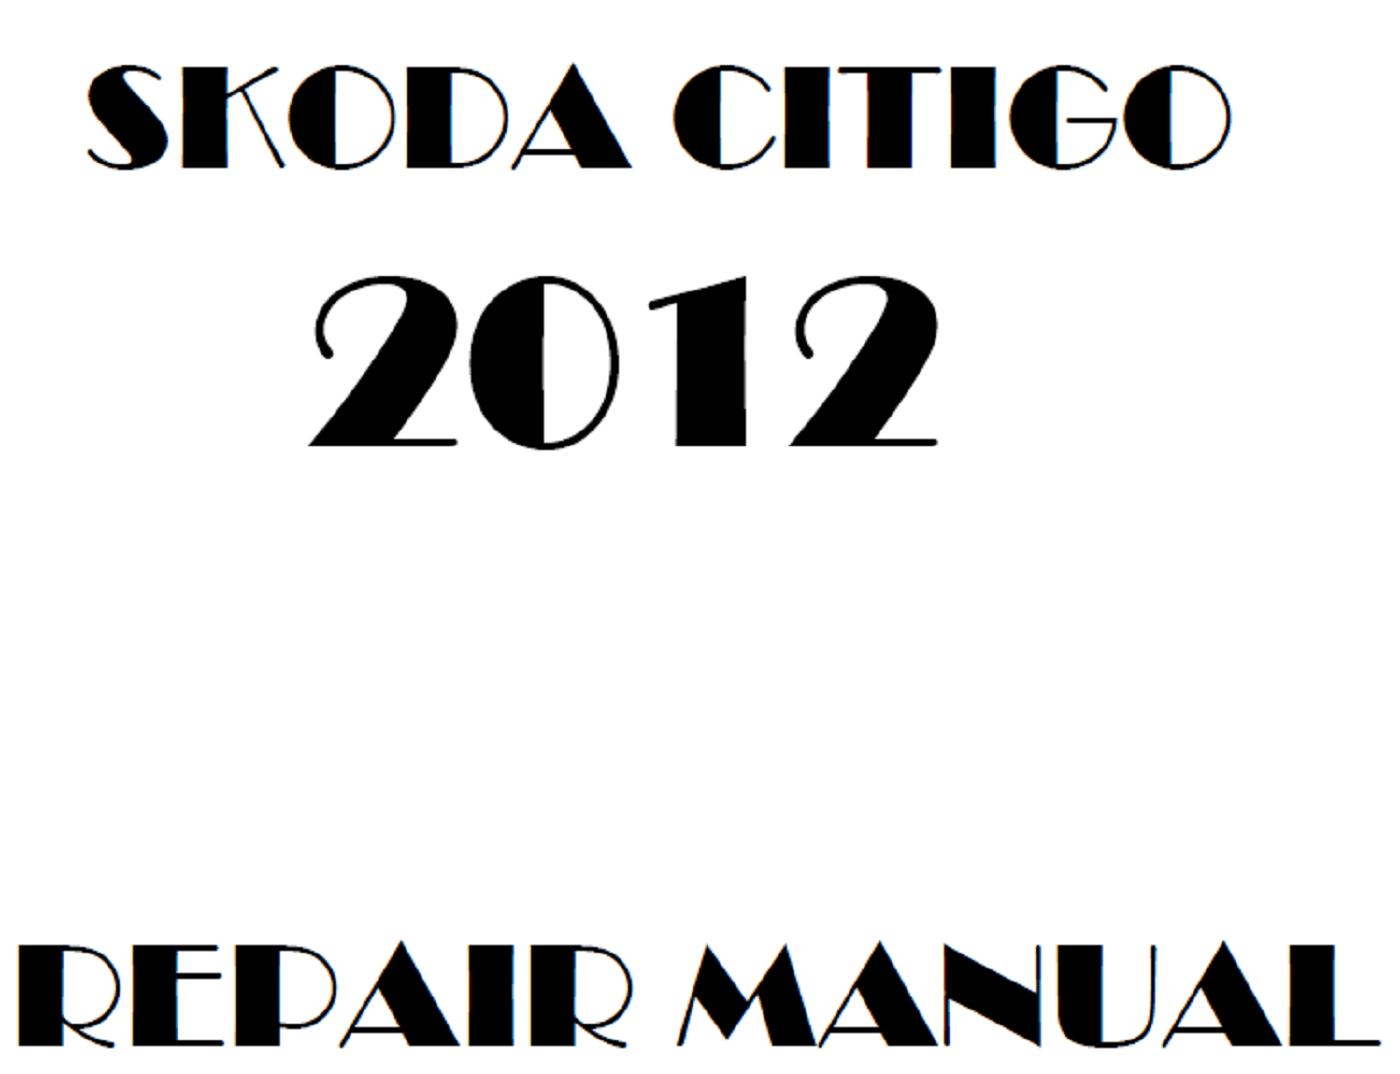 2012 Skoda Citigo repair manual